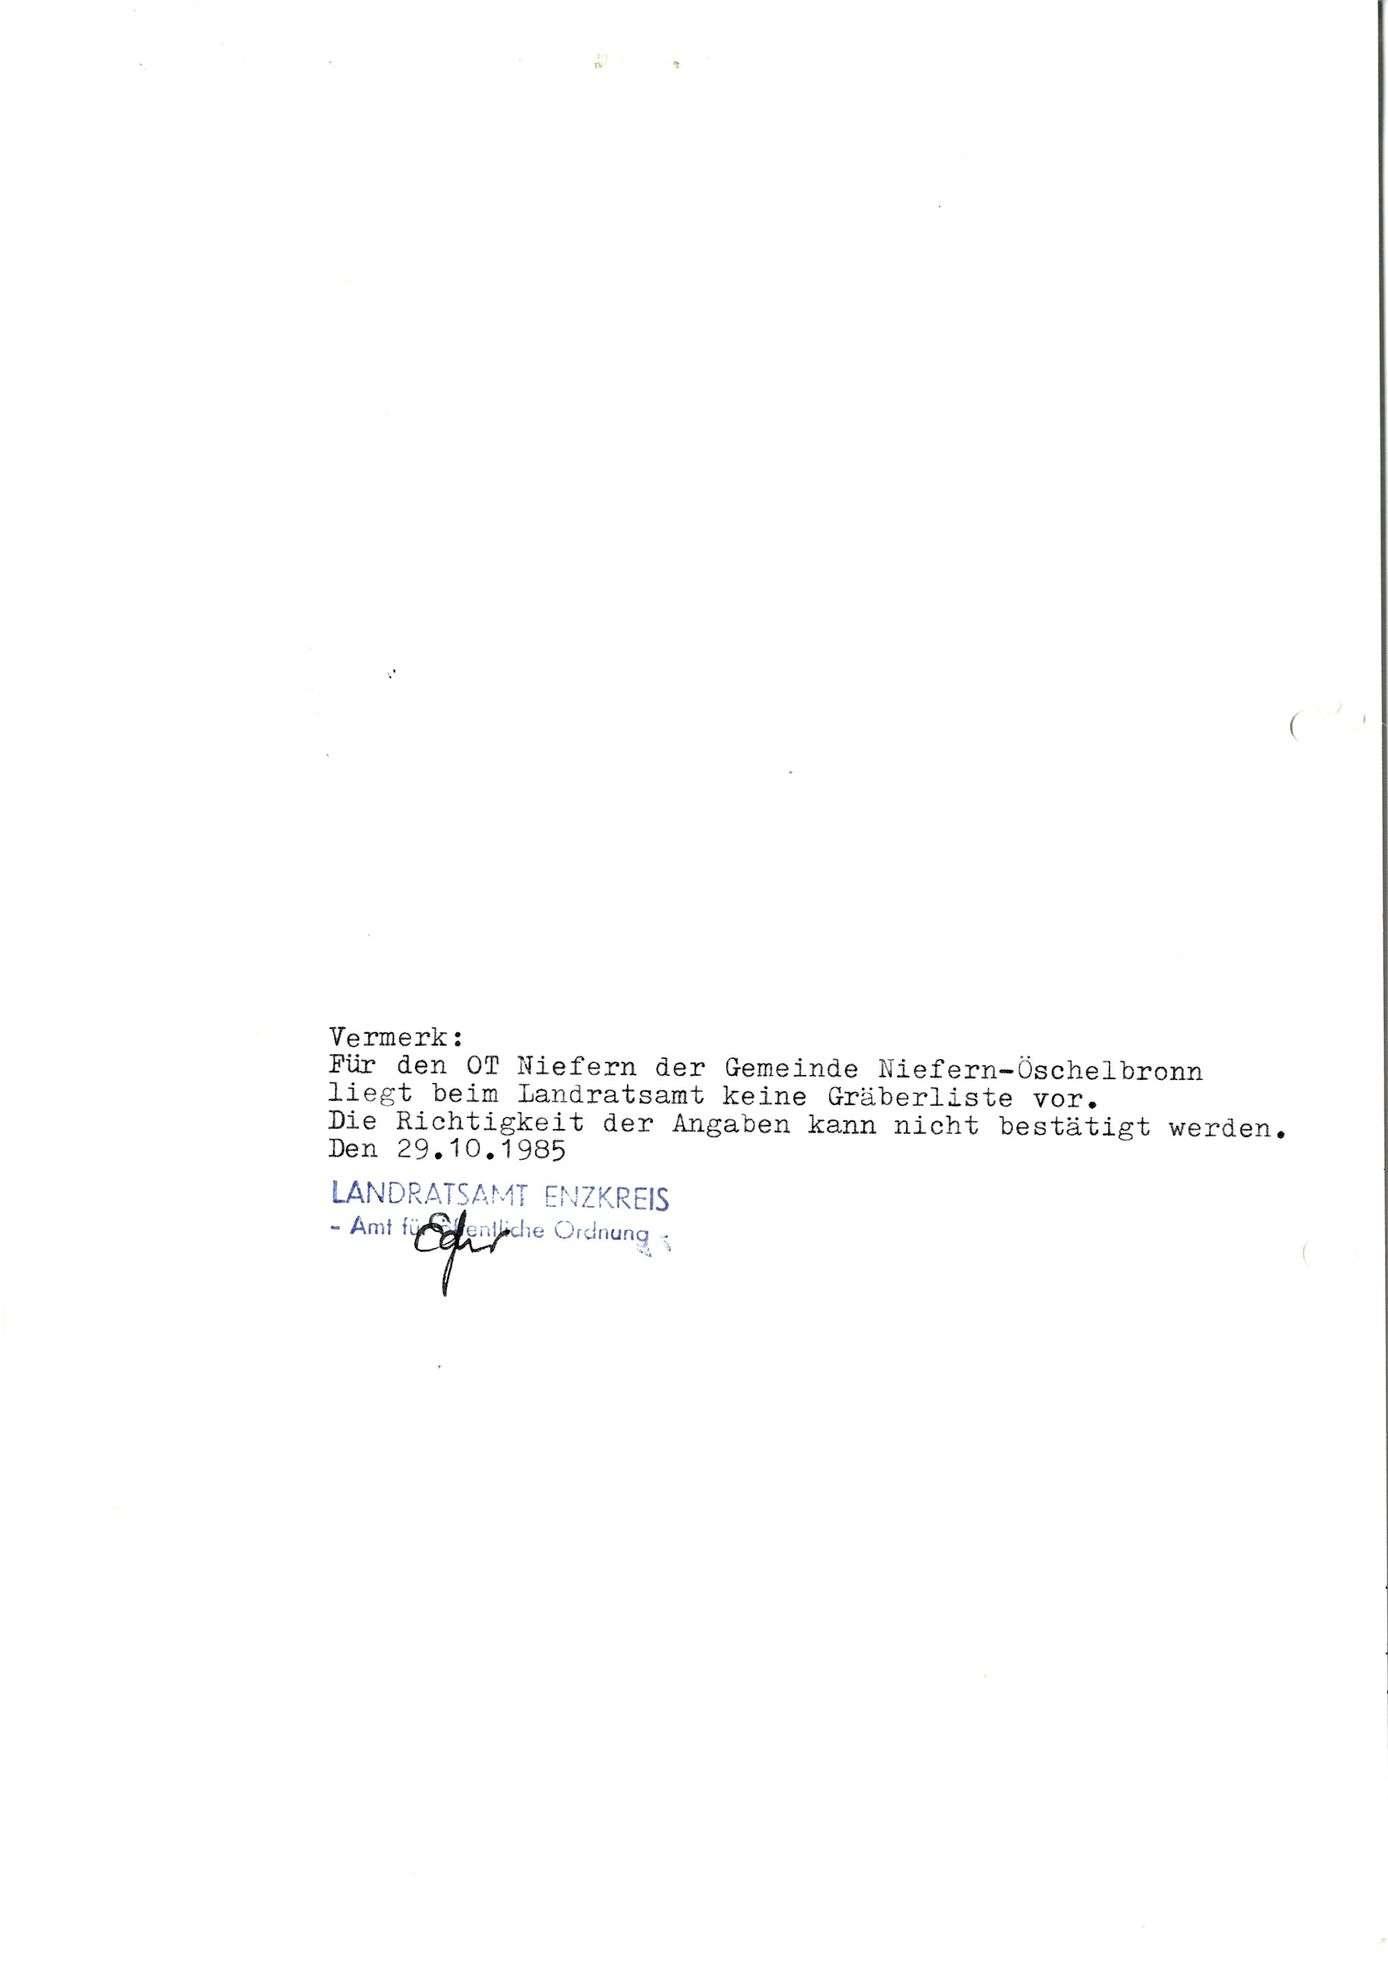 Niefern, Bild 1